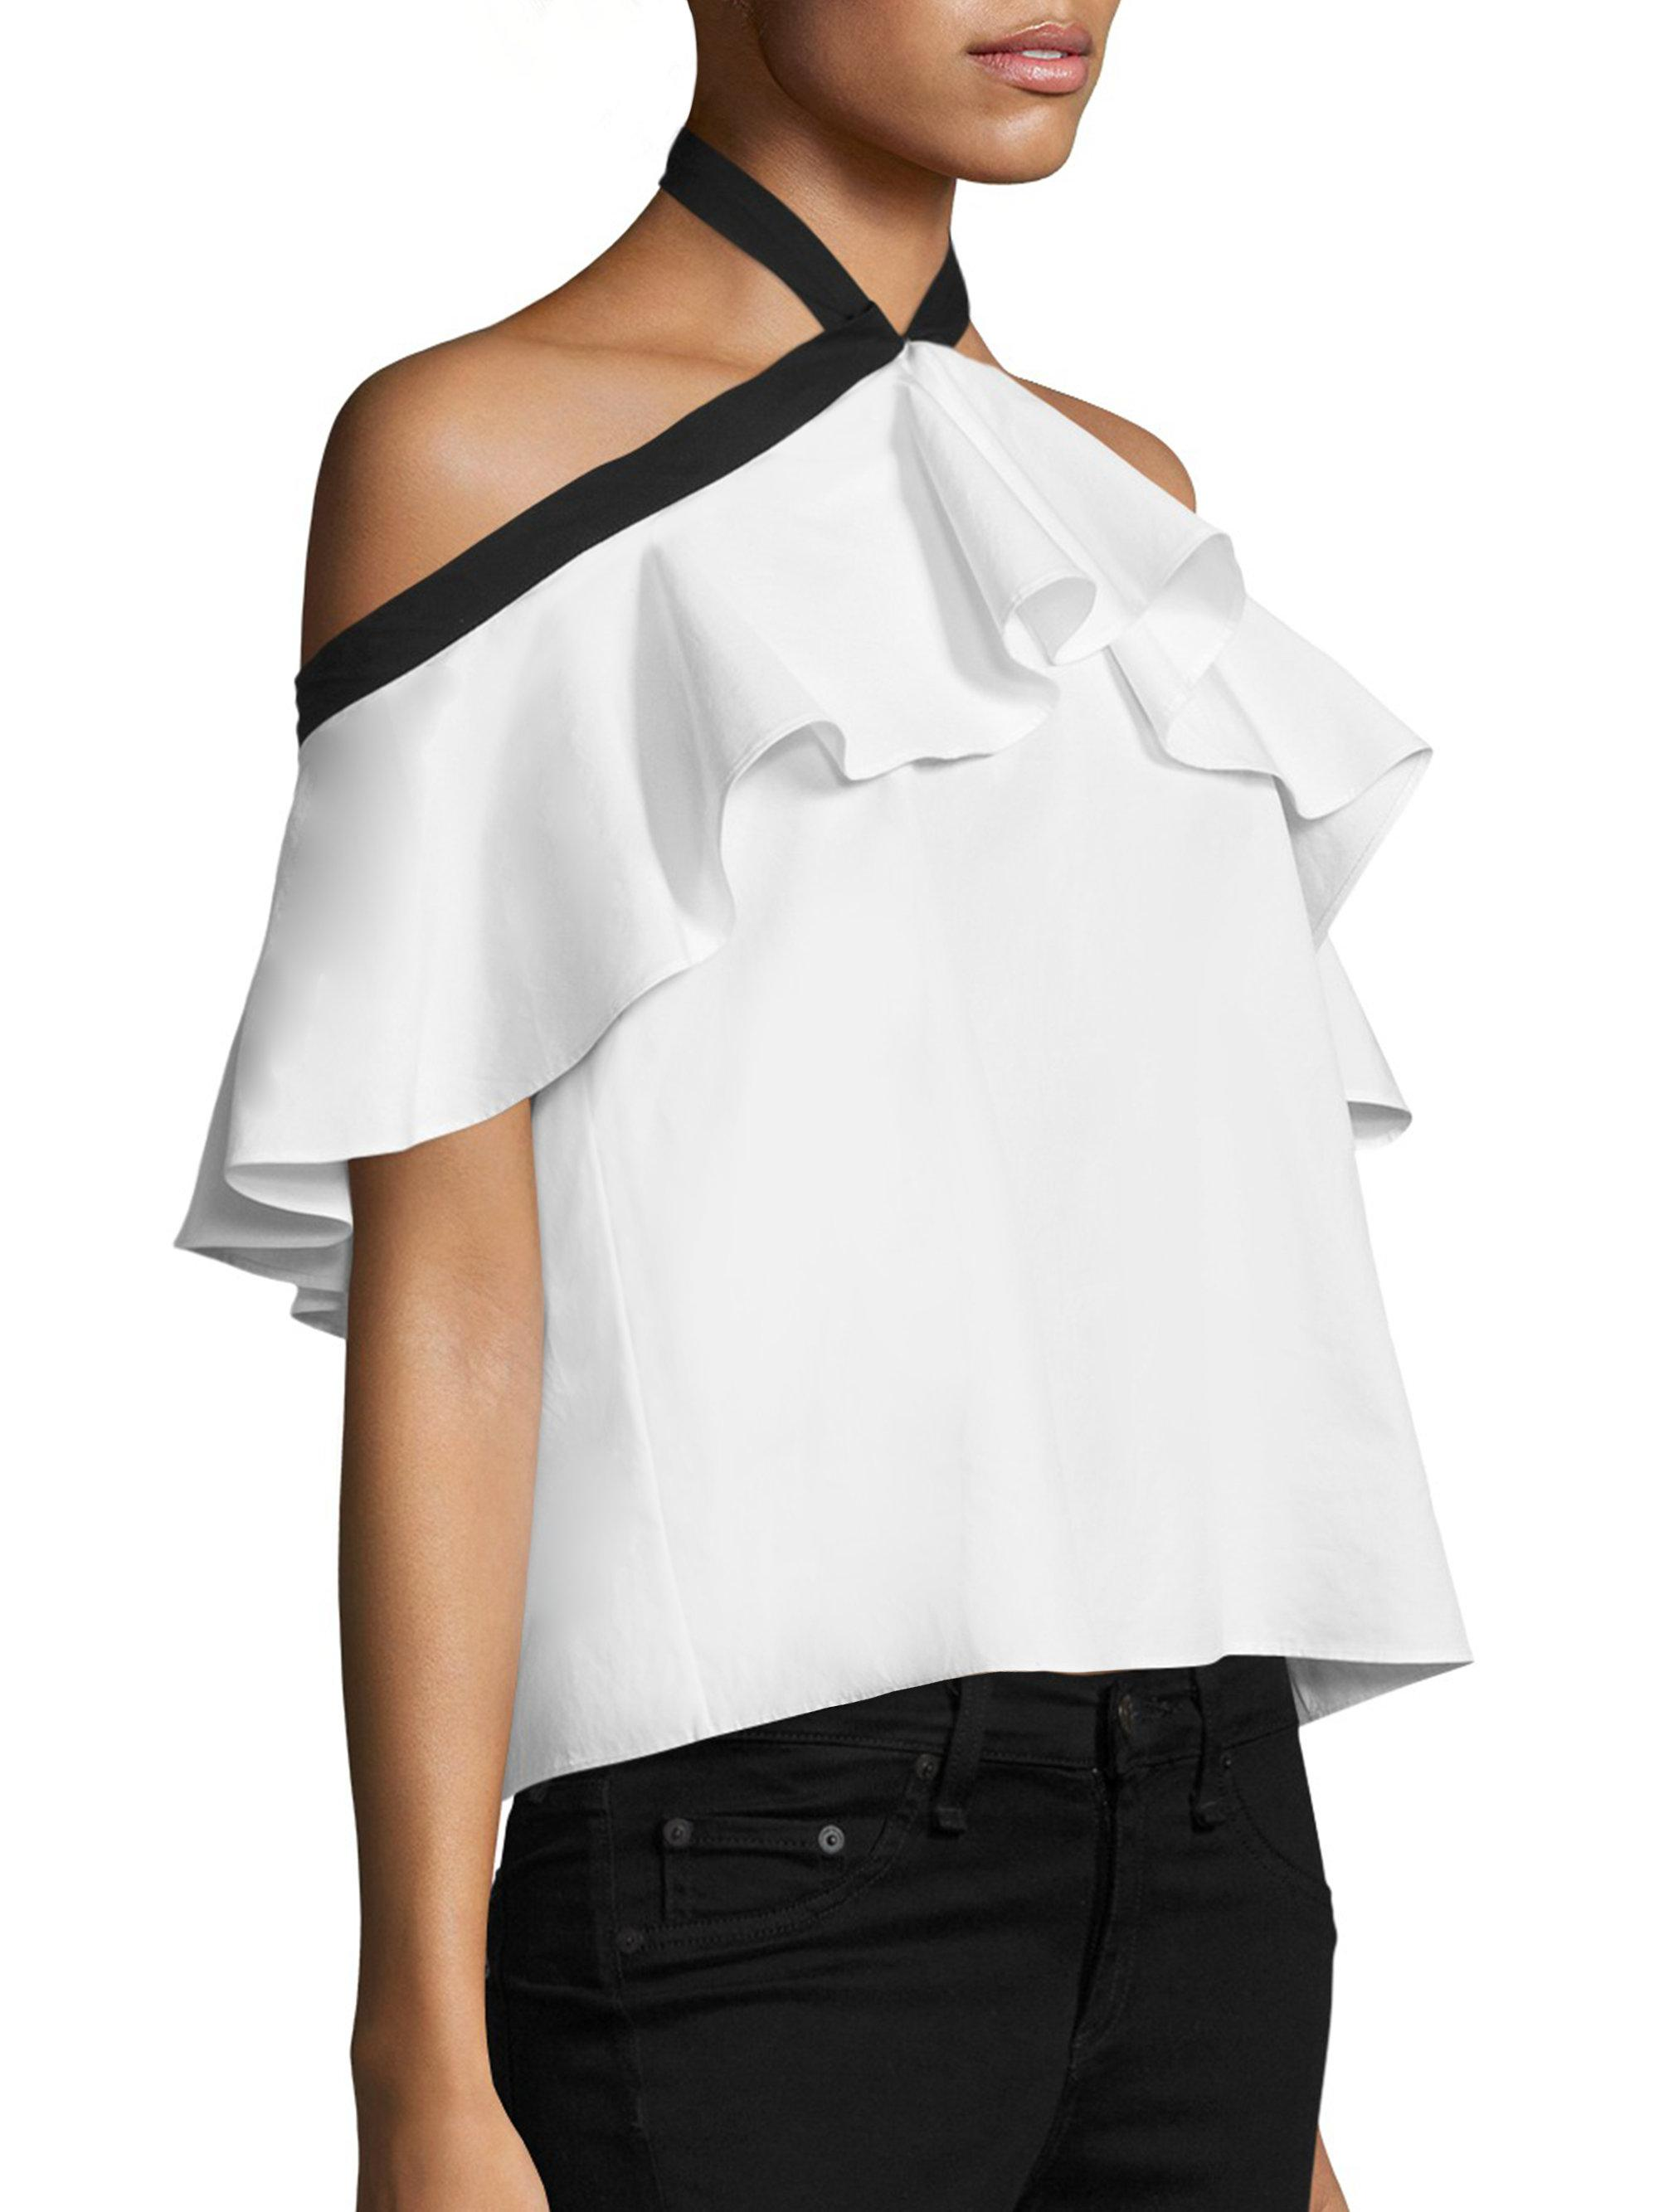 b2f756aa340 Alice + Olivia Alyssa Off-the-shoulder Halter Top in White - Lyst